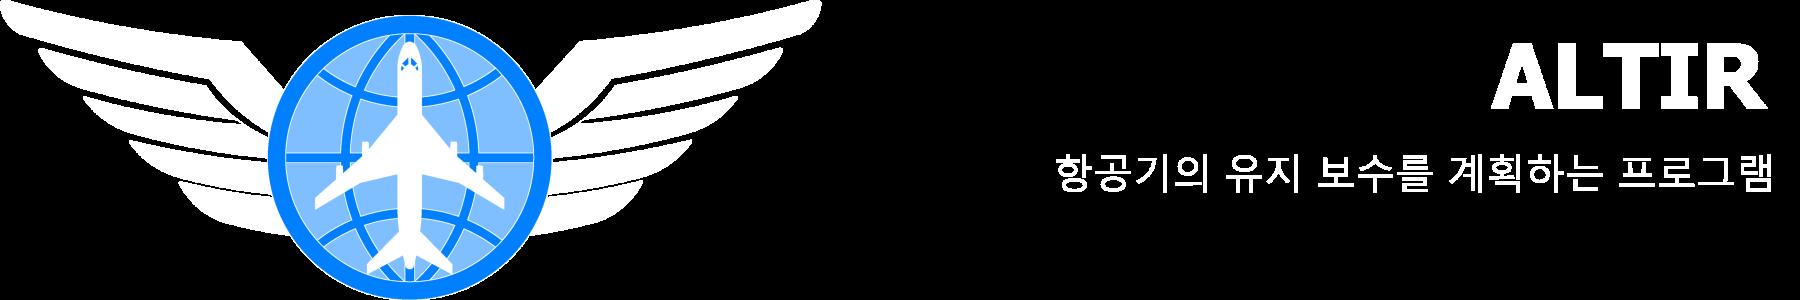 altir logo